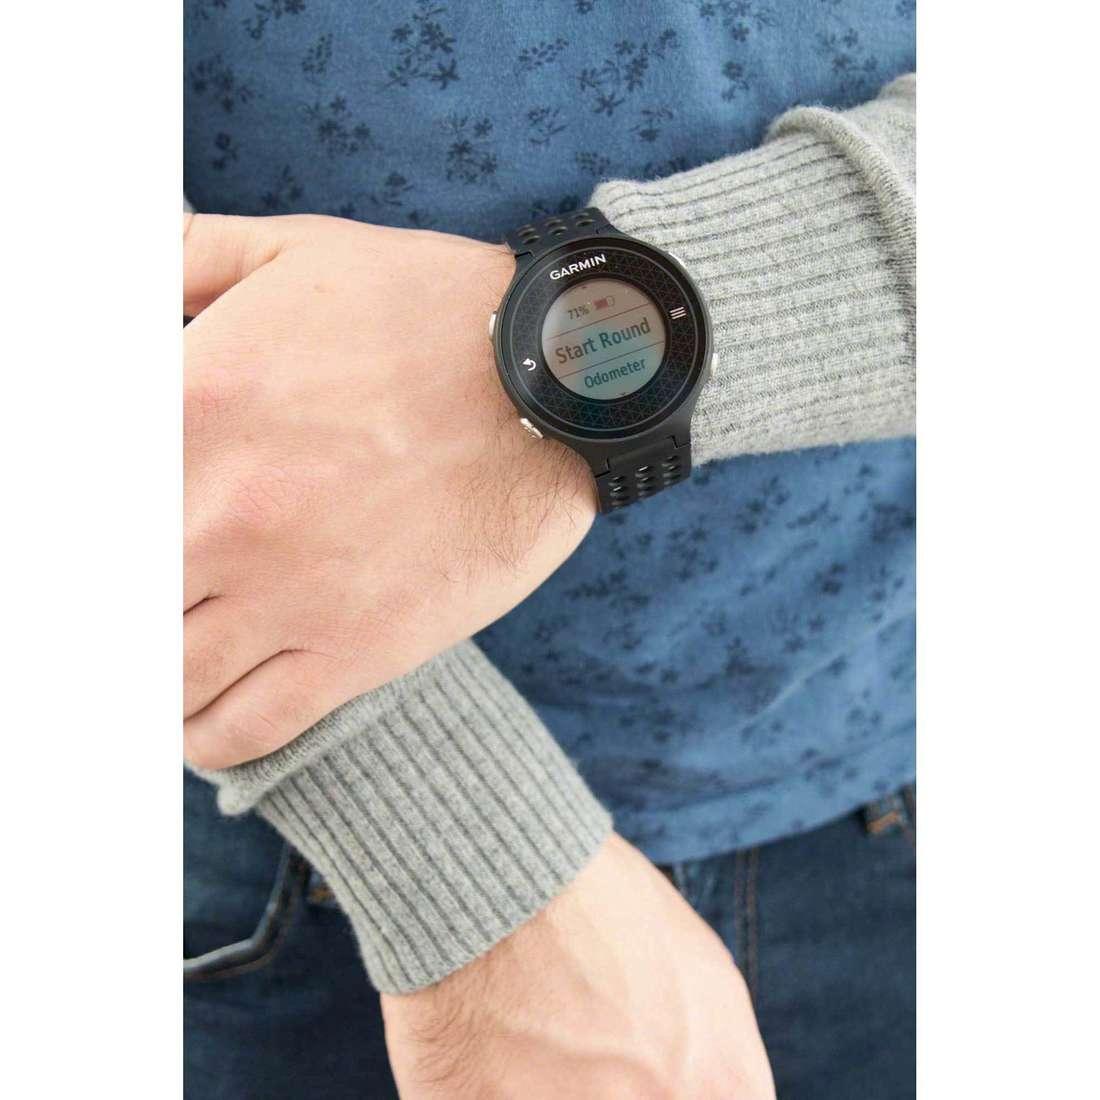 Garmin Smartwatches Golf uomo 010-01195-01 indosso